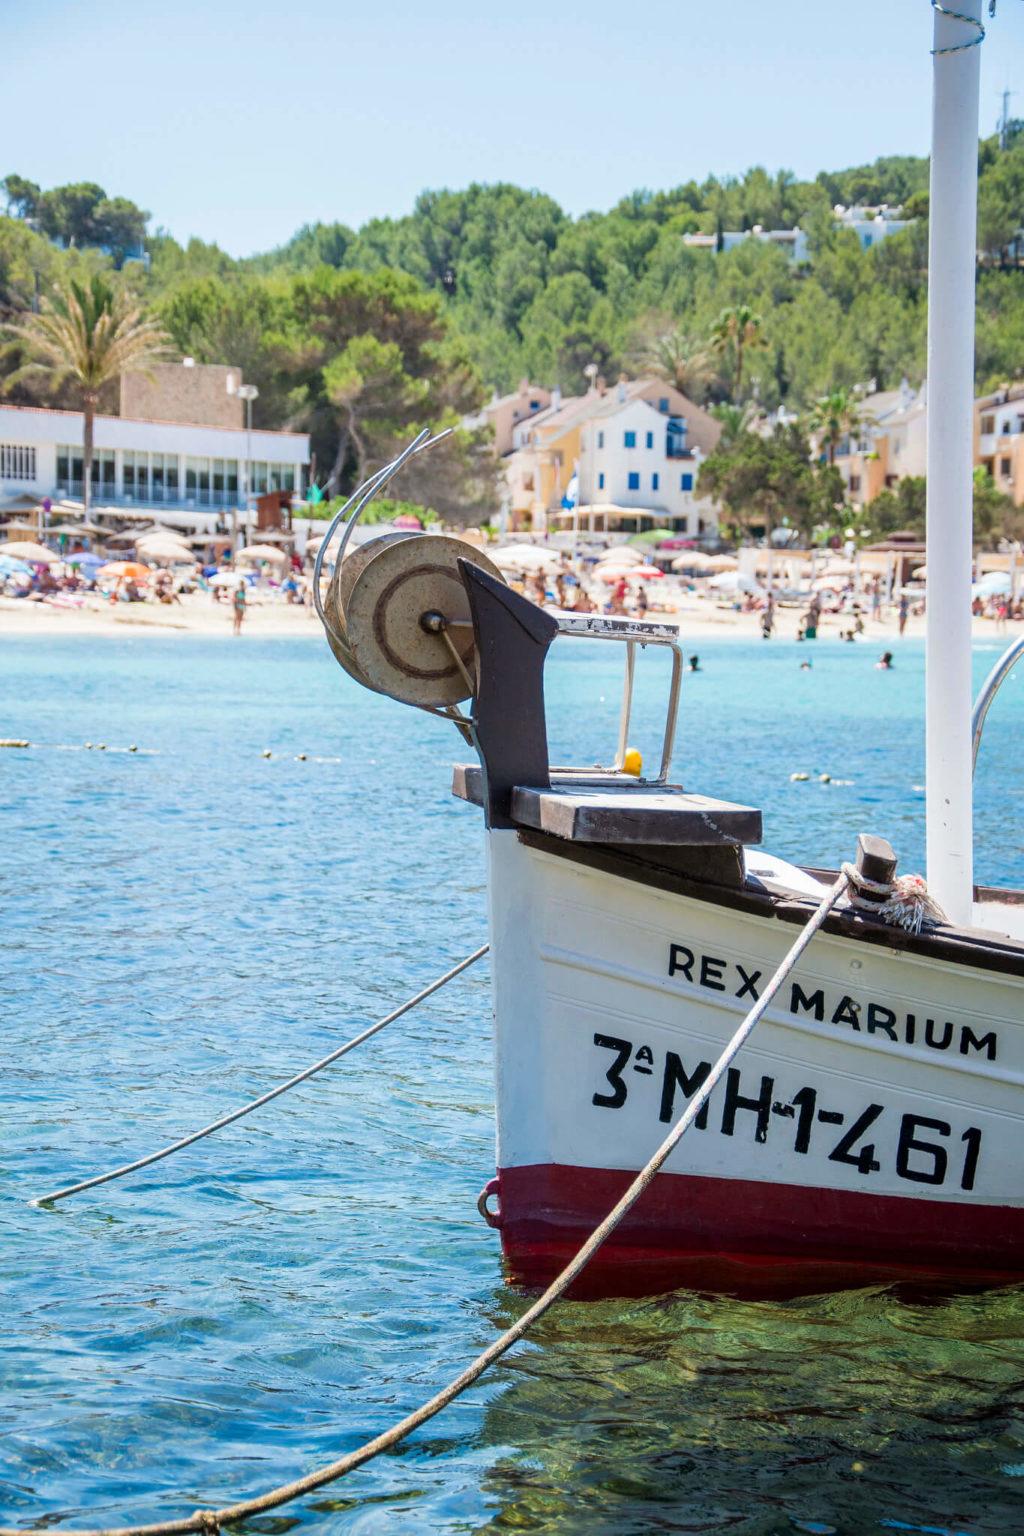 https://www.white-ibiza.com/wp-content/uploads/2020/03/ibiza-beaches-cala-vadella-03-1024x1536.jpg